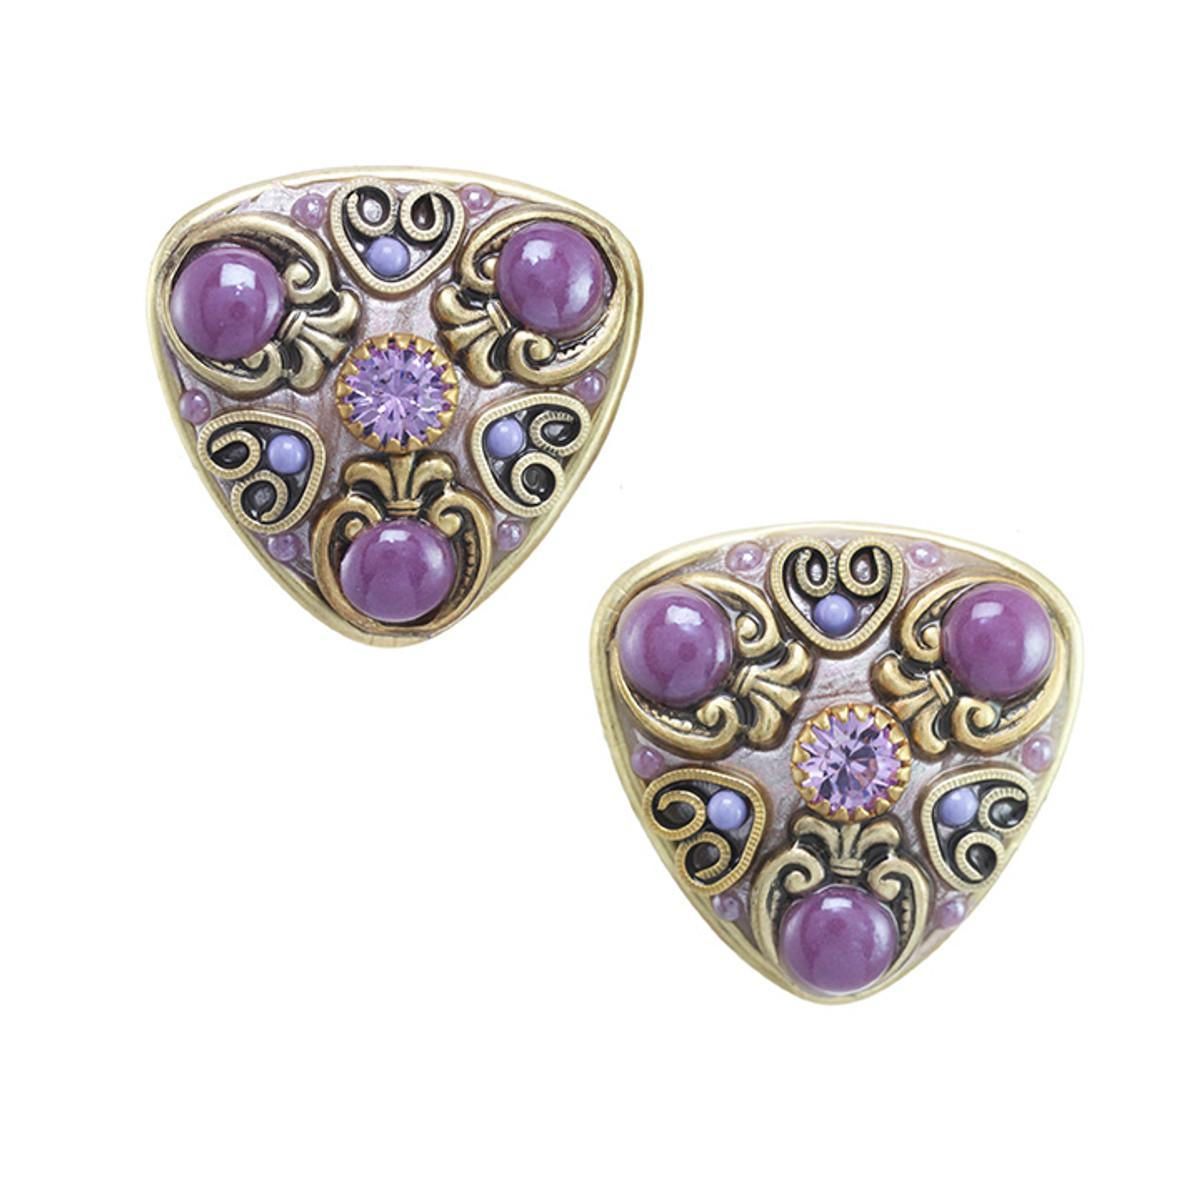 Purple Lilac style earrings by Michal Golan Jewelry